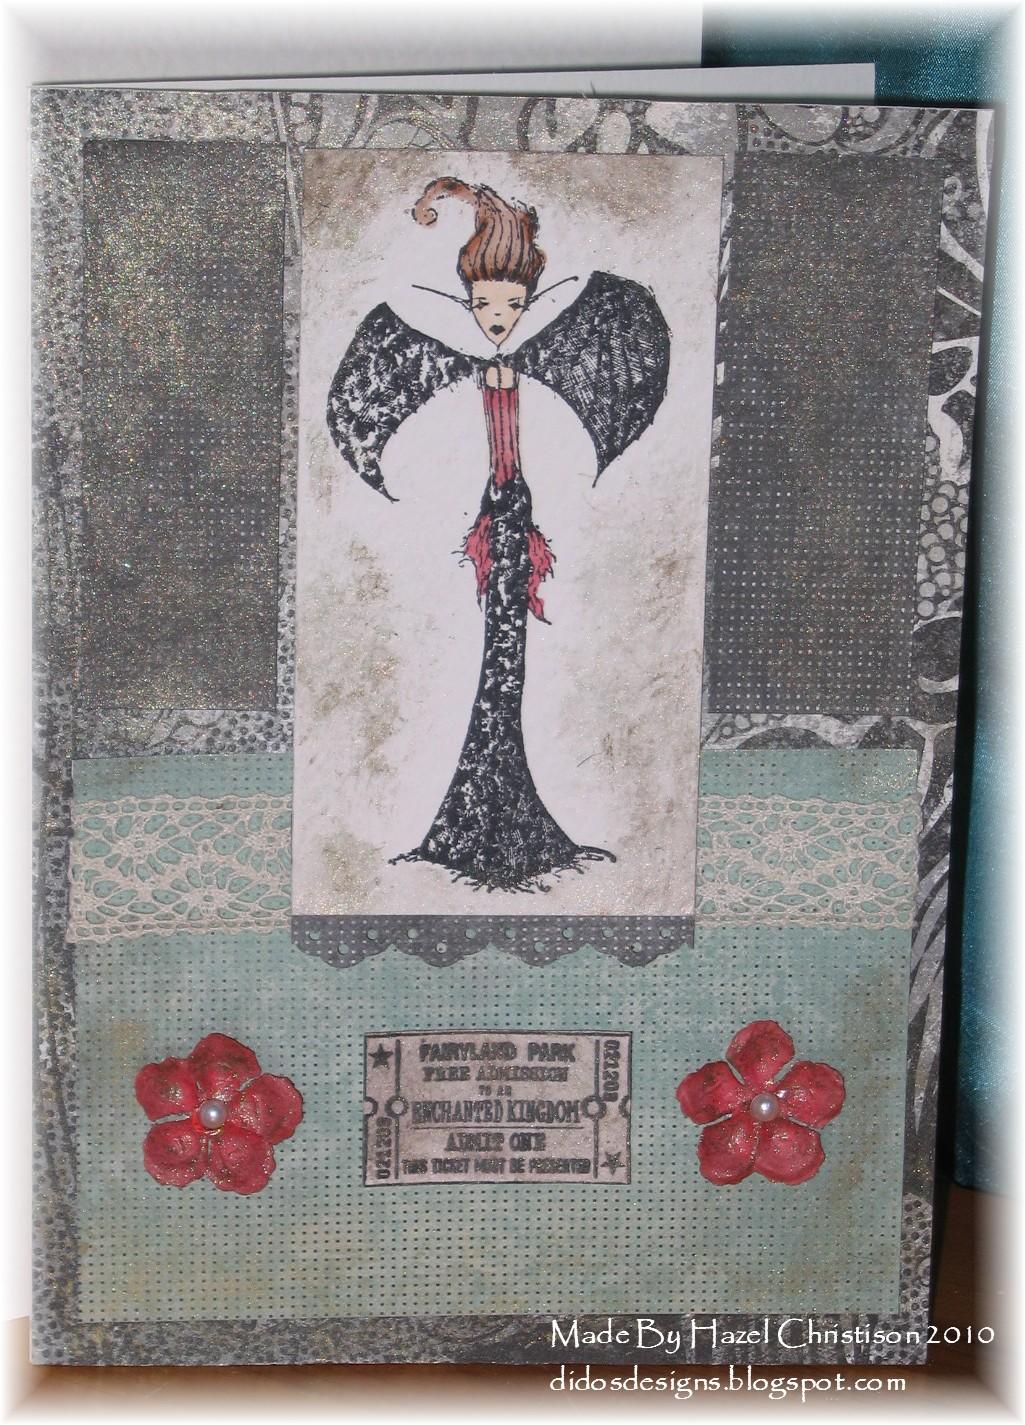 http://1.bp.blogspot.com/_ihXMJn_SHoI/S_fEEe4G4ZI/AAAAAAAADBI/MVTIXbmcElw/s1600/Cards+By+Dido%27s+Designs+003.JPG